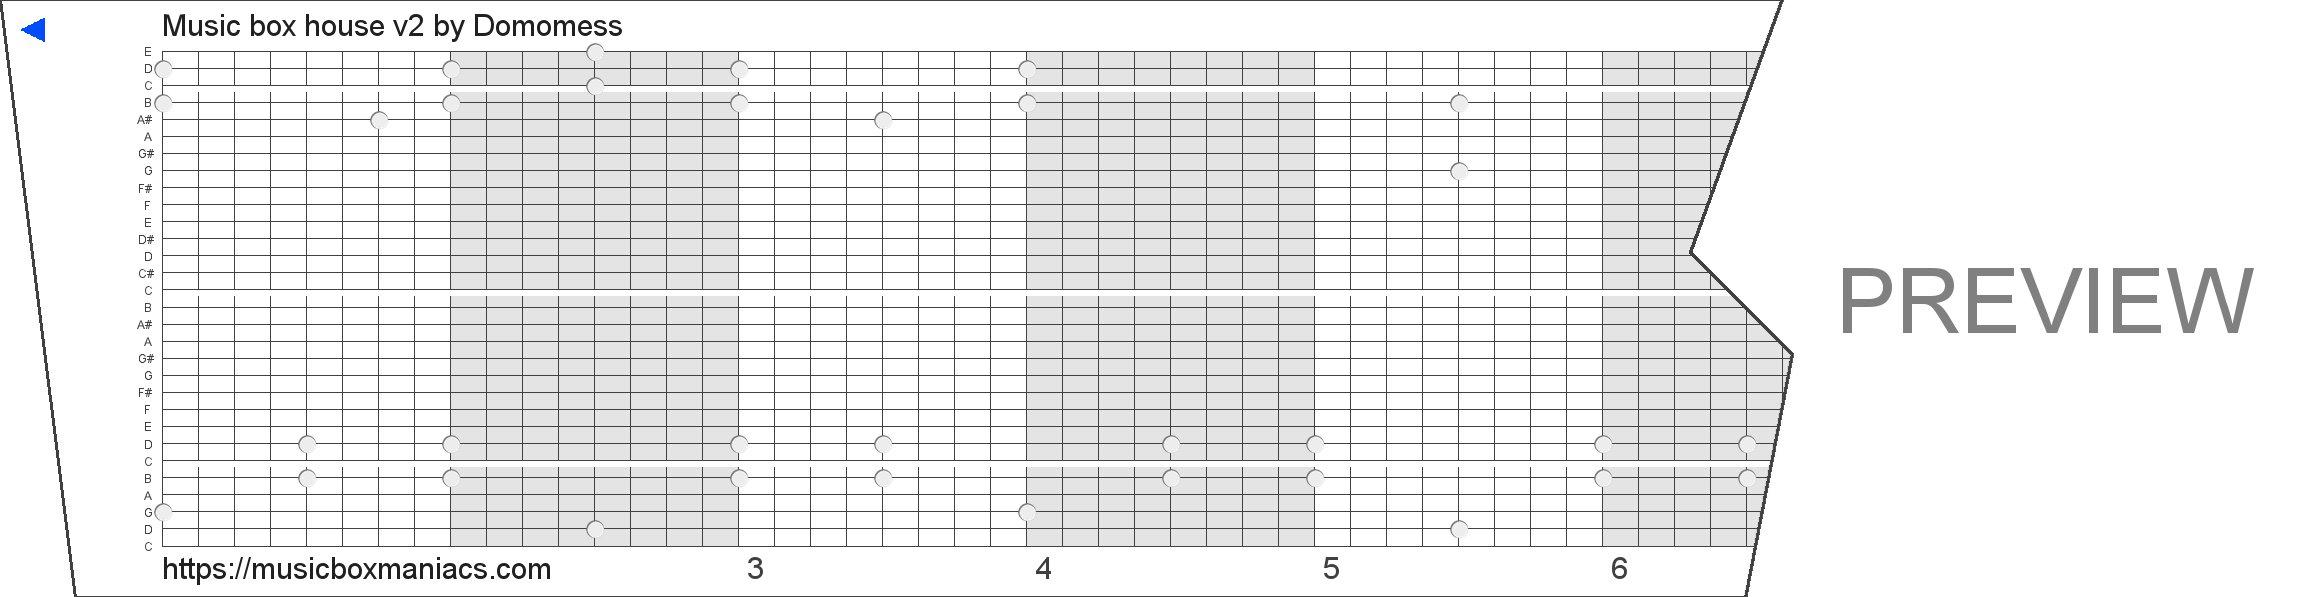 Music box house v2 30 note music box paper strip